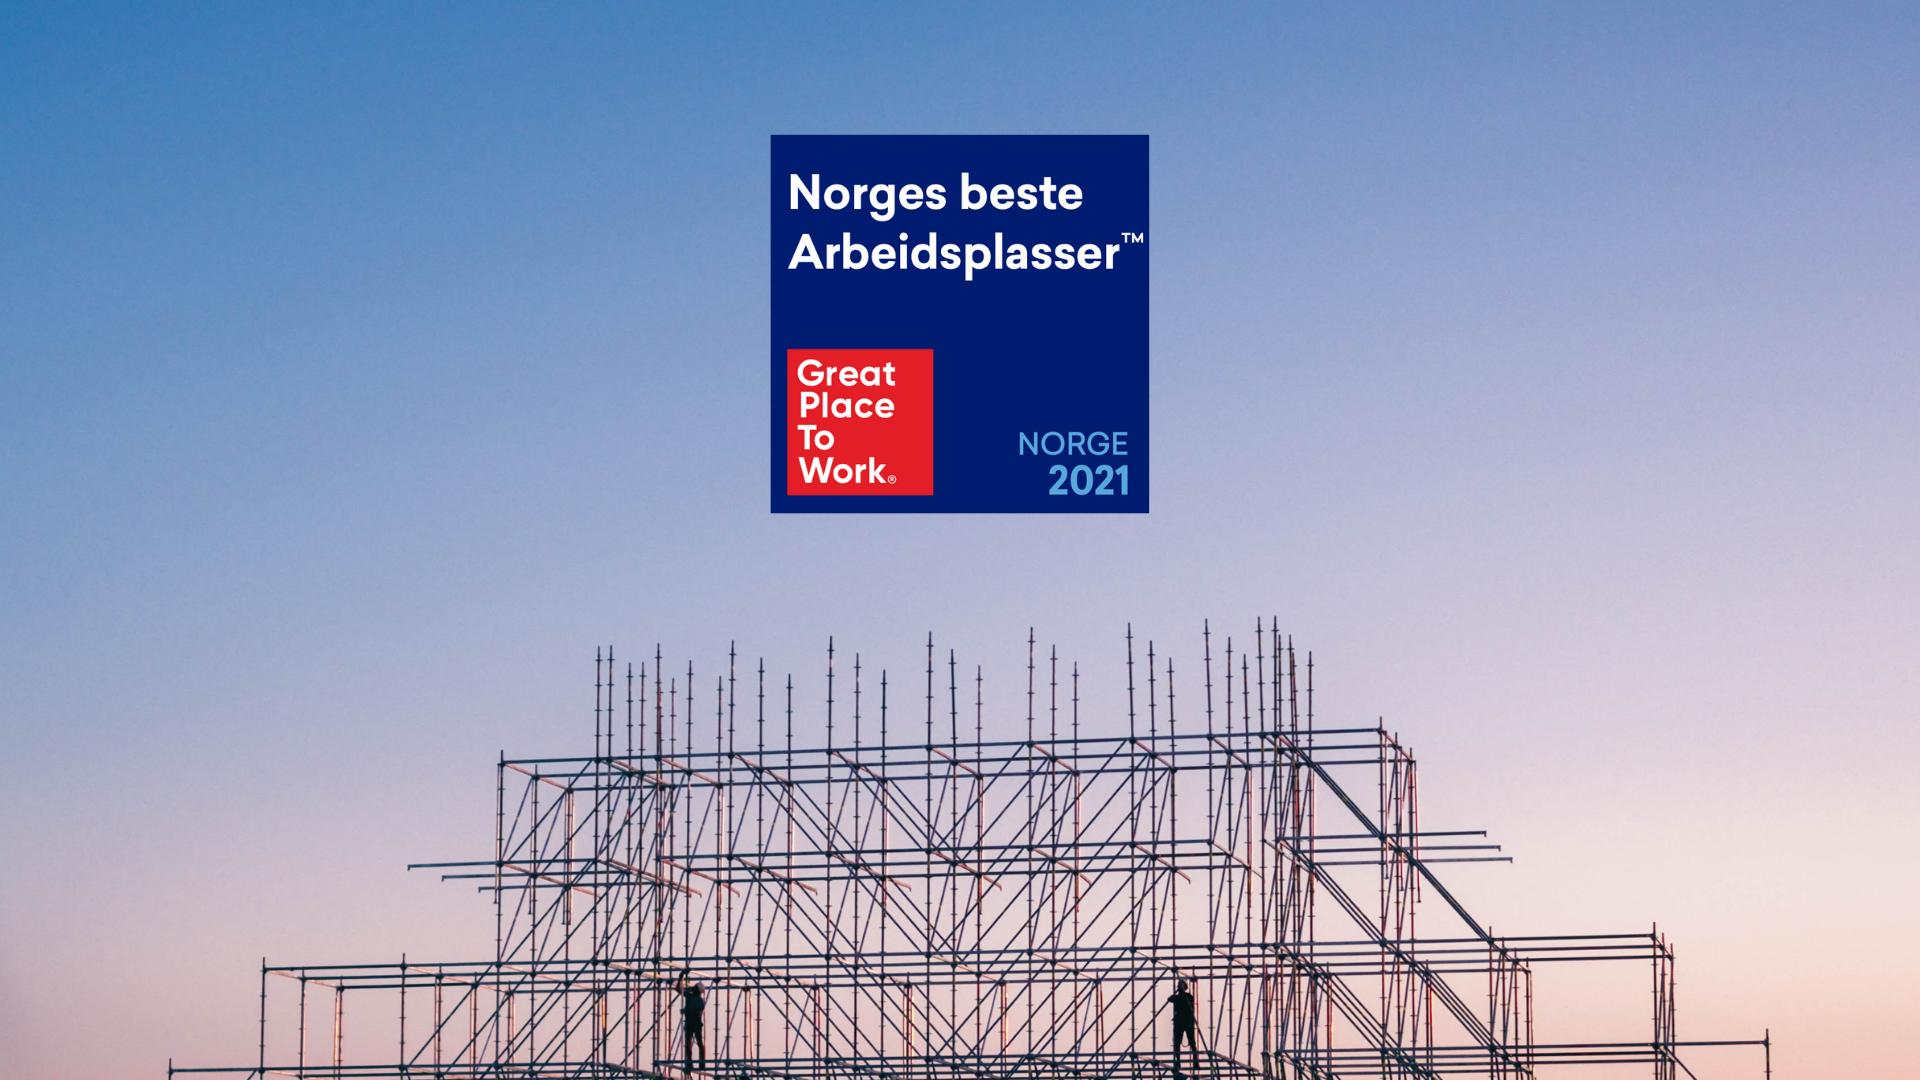 norges-beste-arbeidsplasser